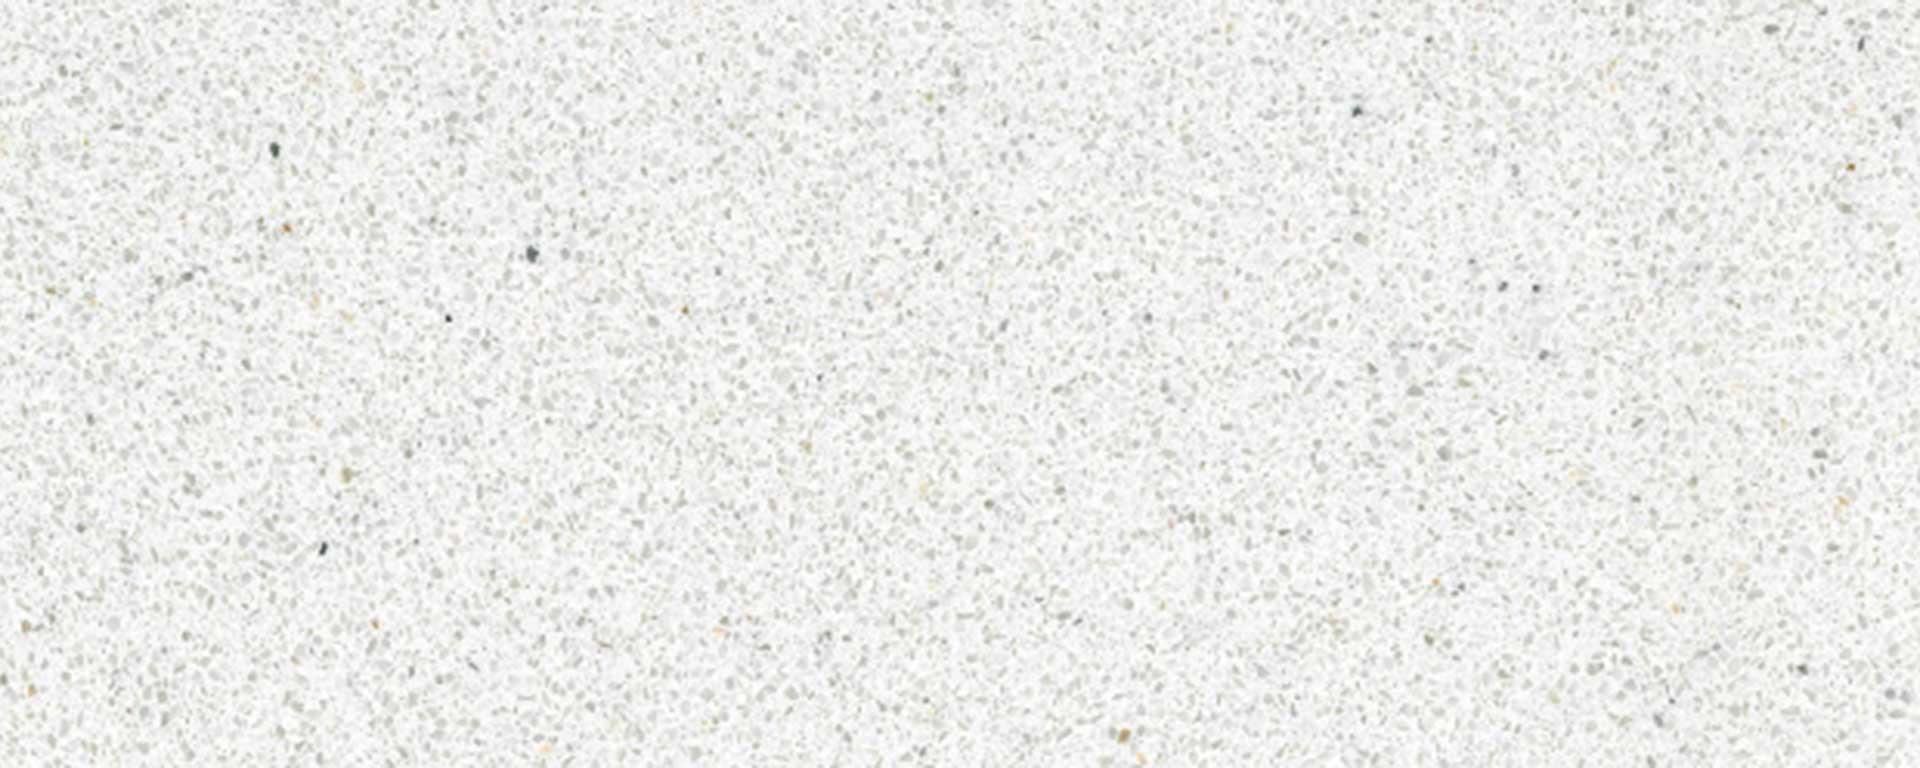 MMDR-005-terrazzo-marmo-resina-